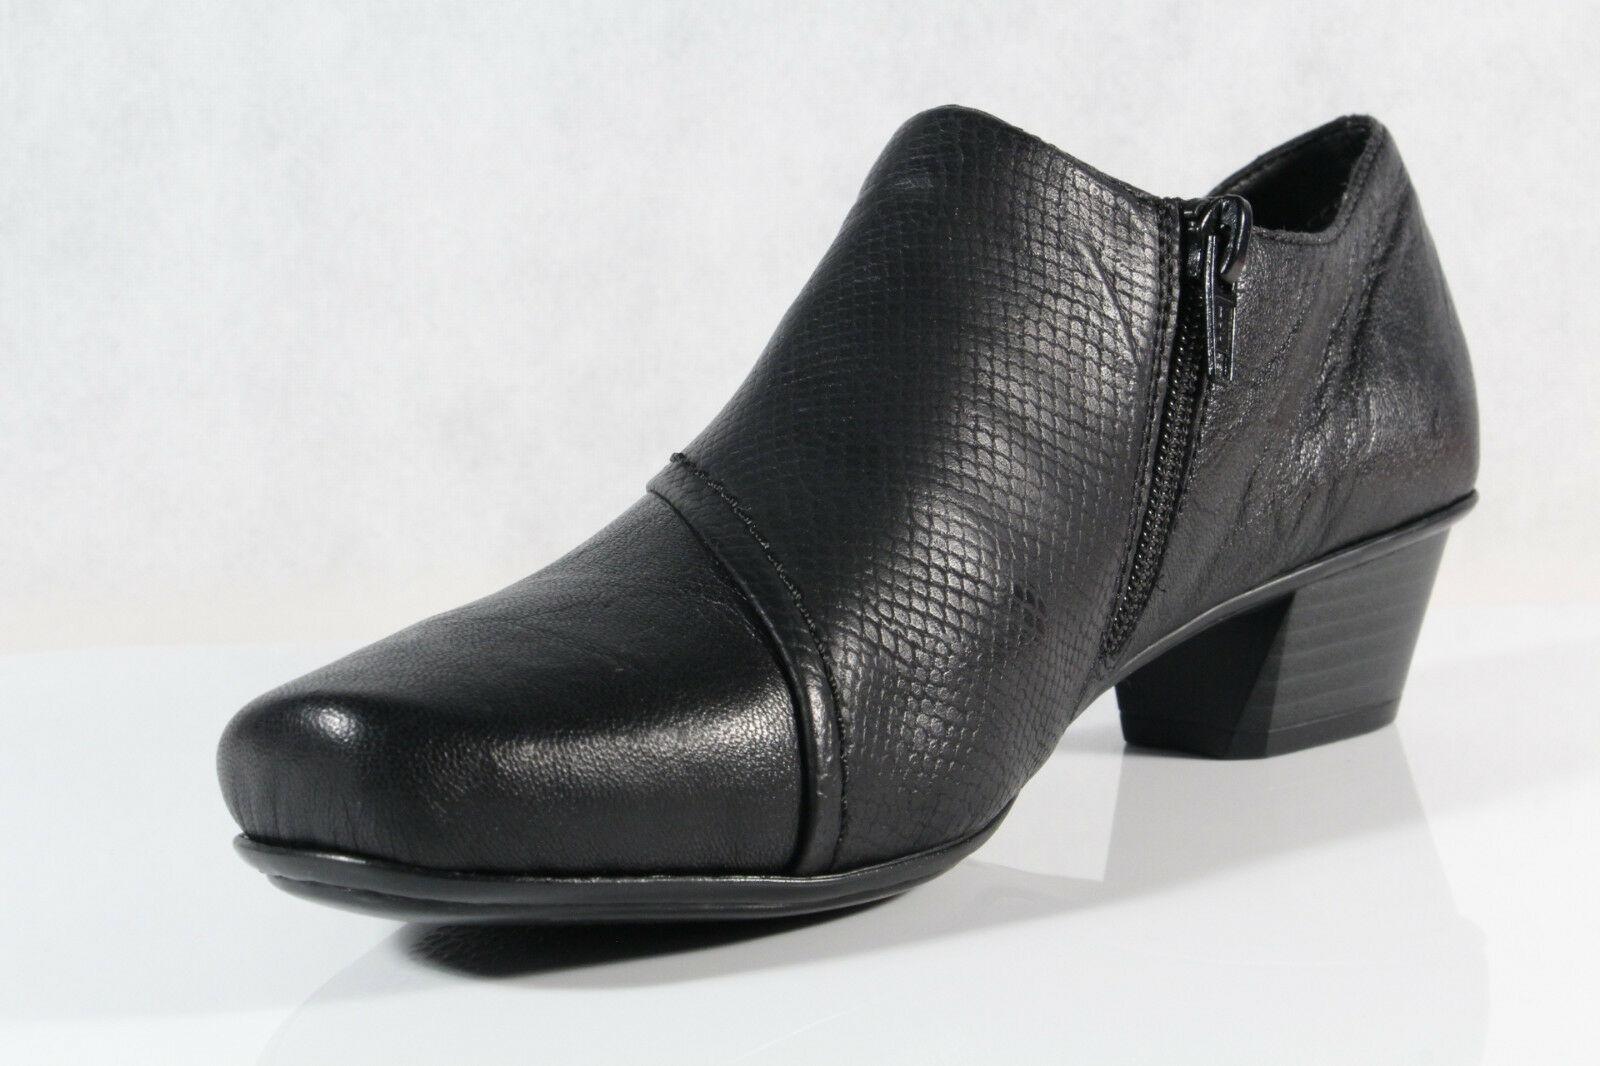 Rieker Damen Slipper Halbschuhe, Sneakers schwarz Echtleder W0Iu2